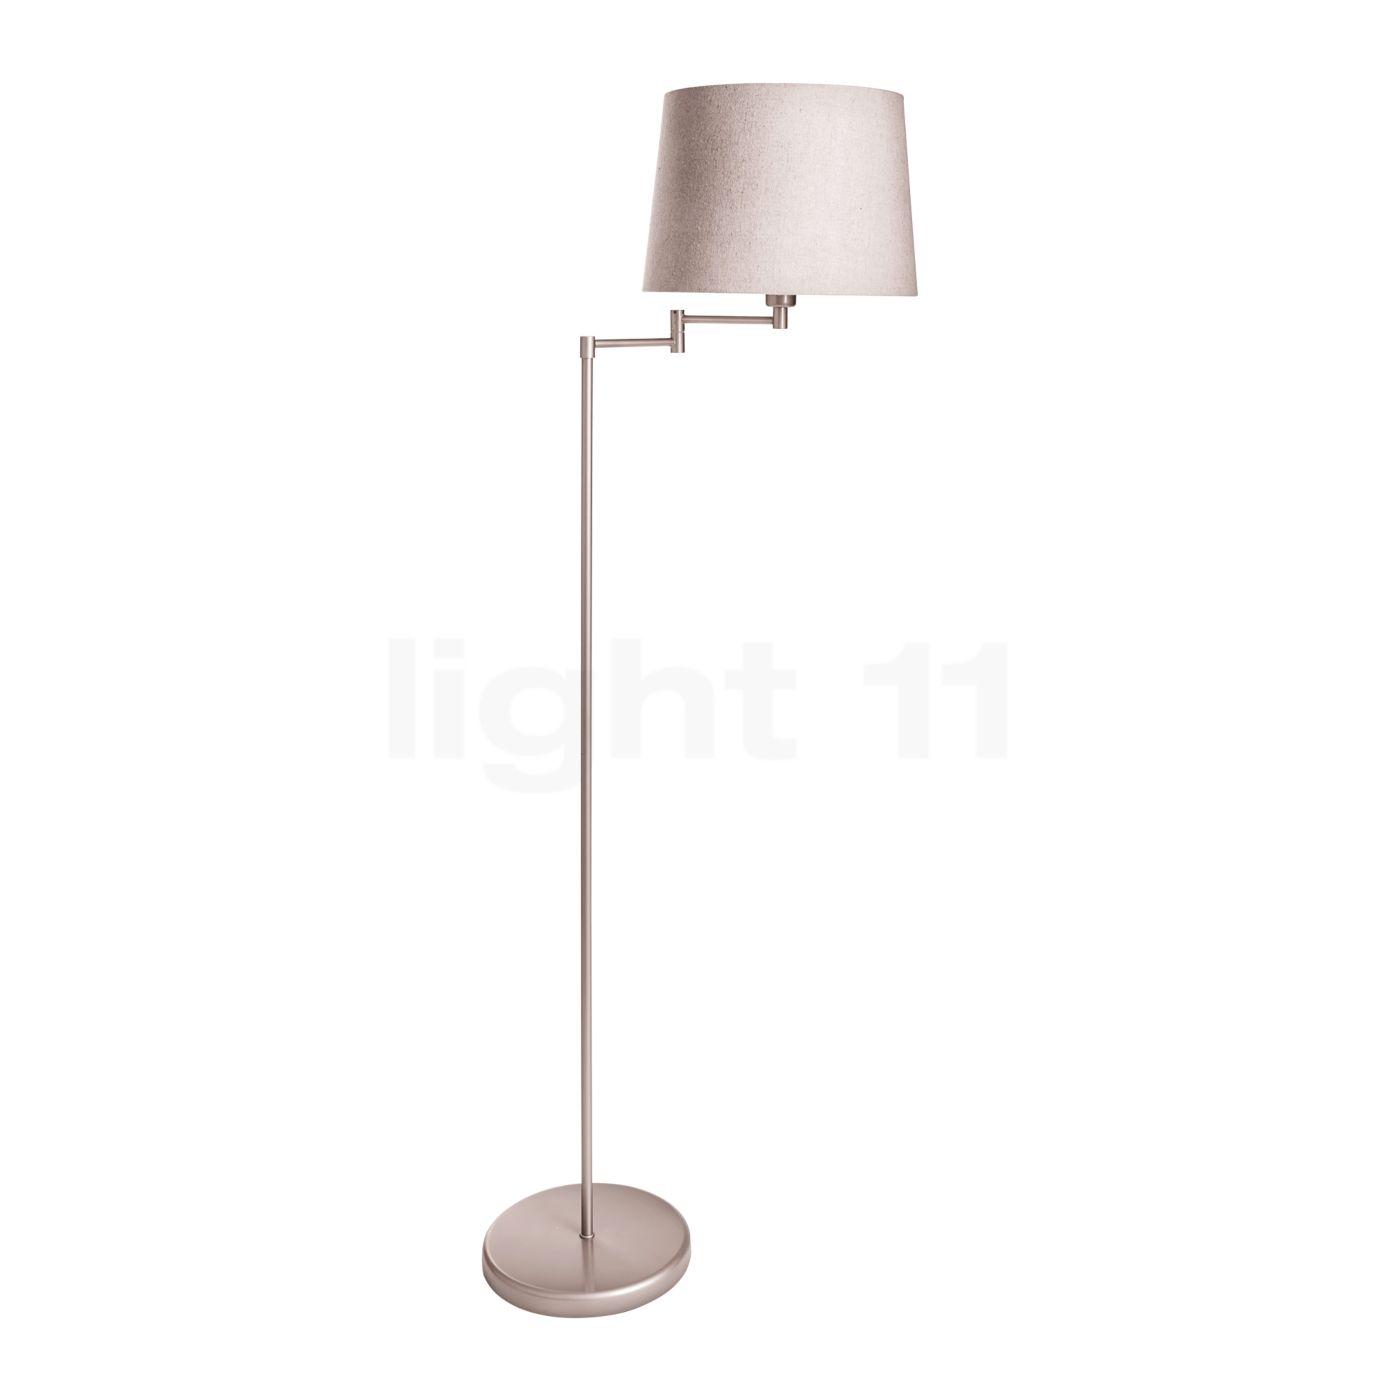 Philips myliving donne floor lamps buy at light11 aloadofball Gallery